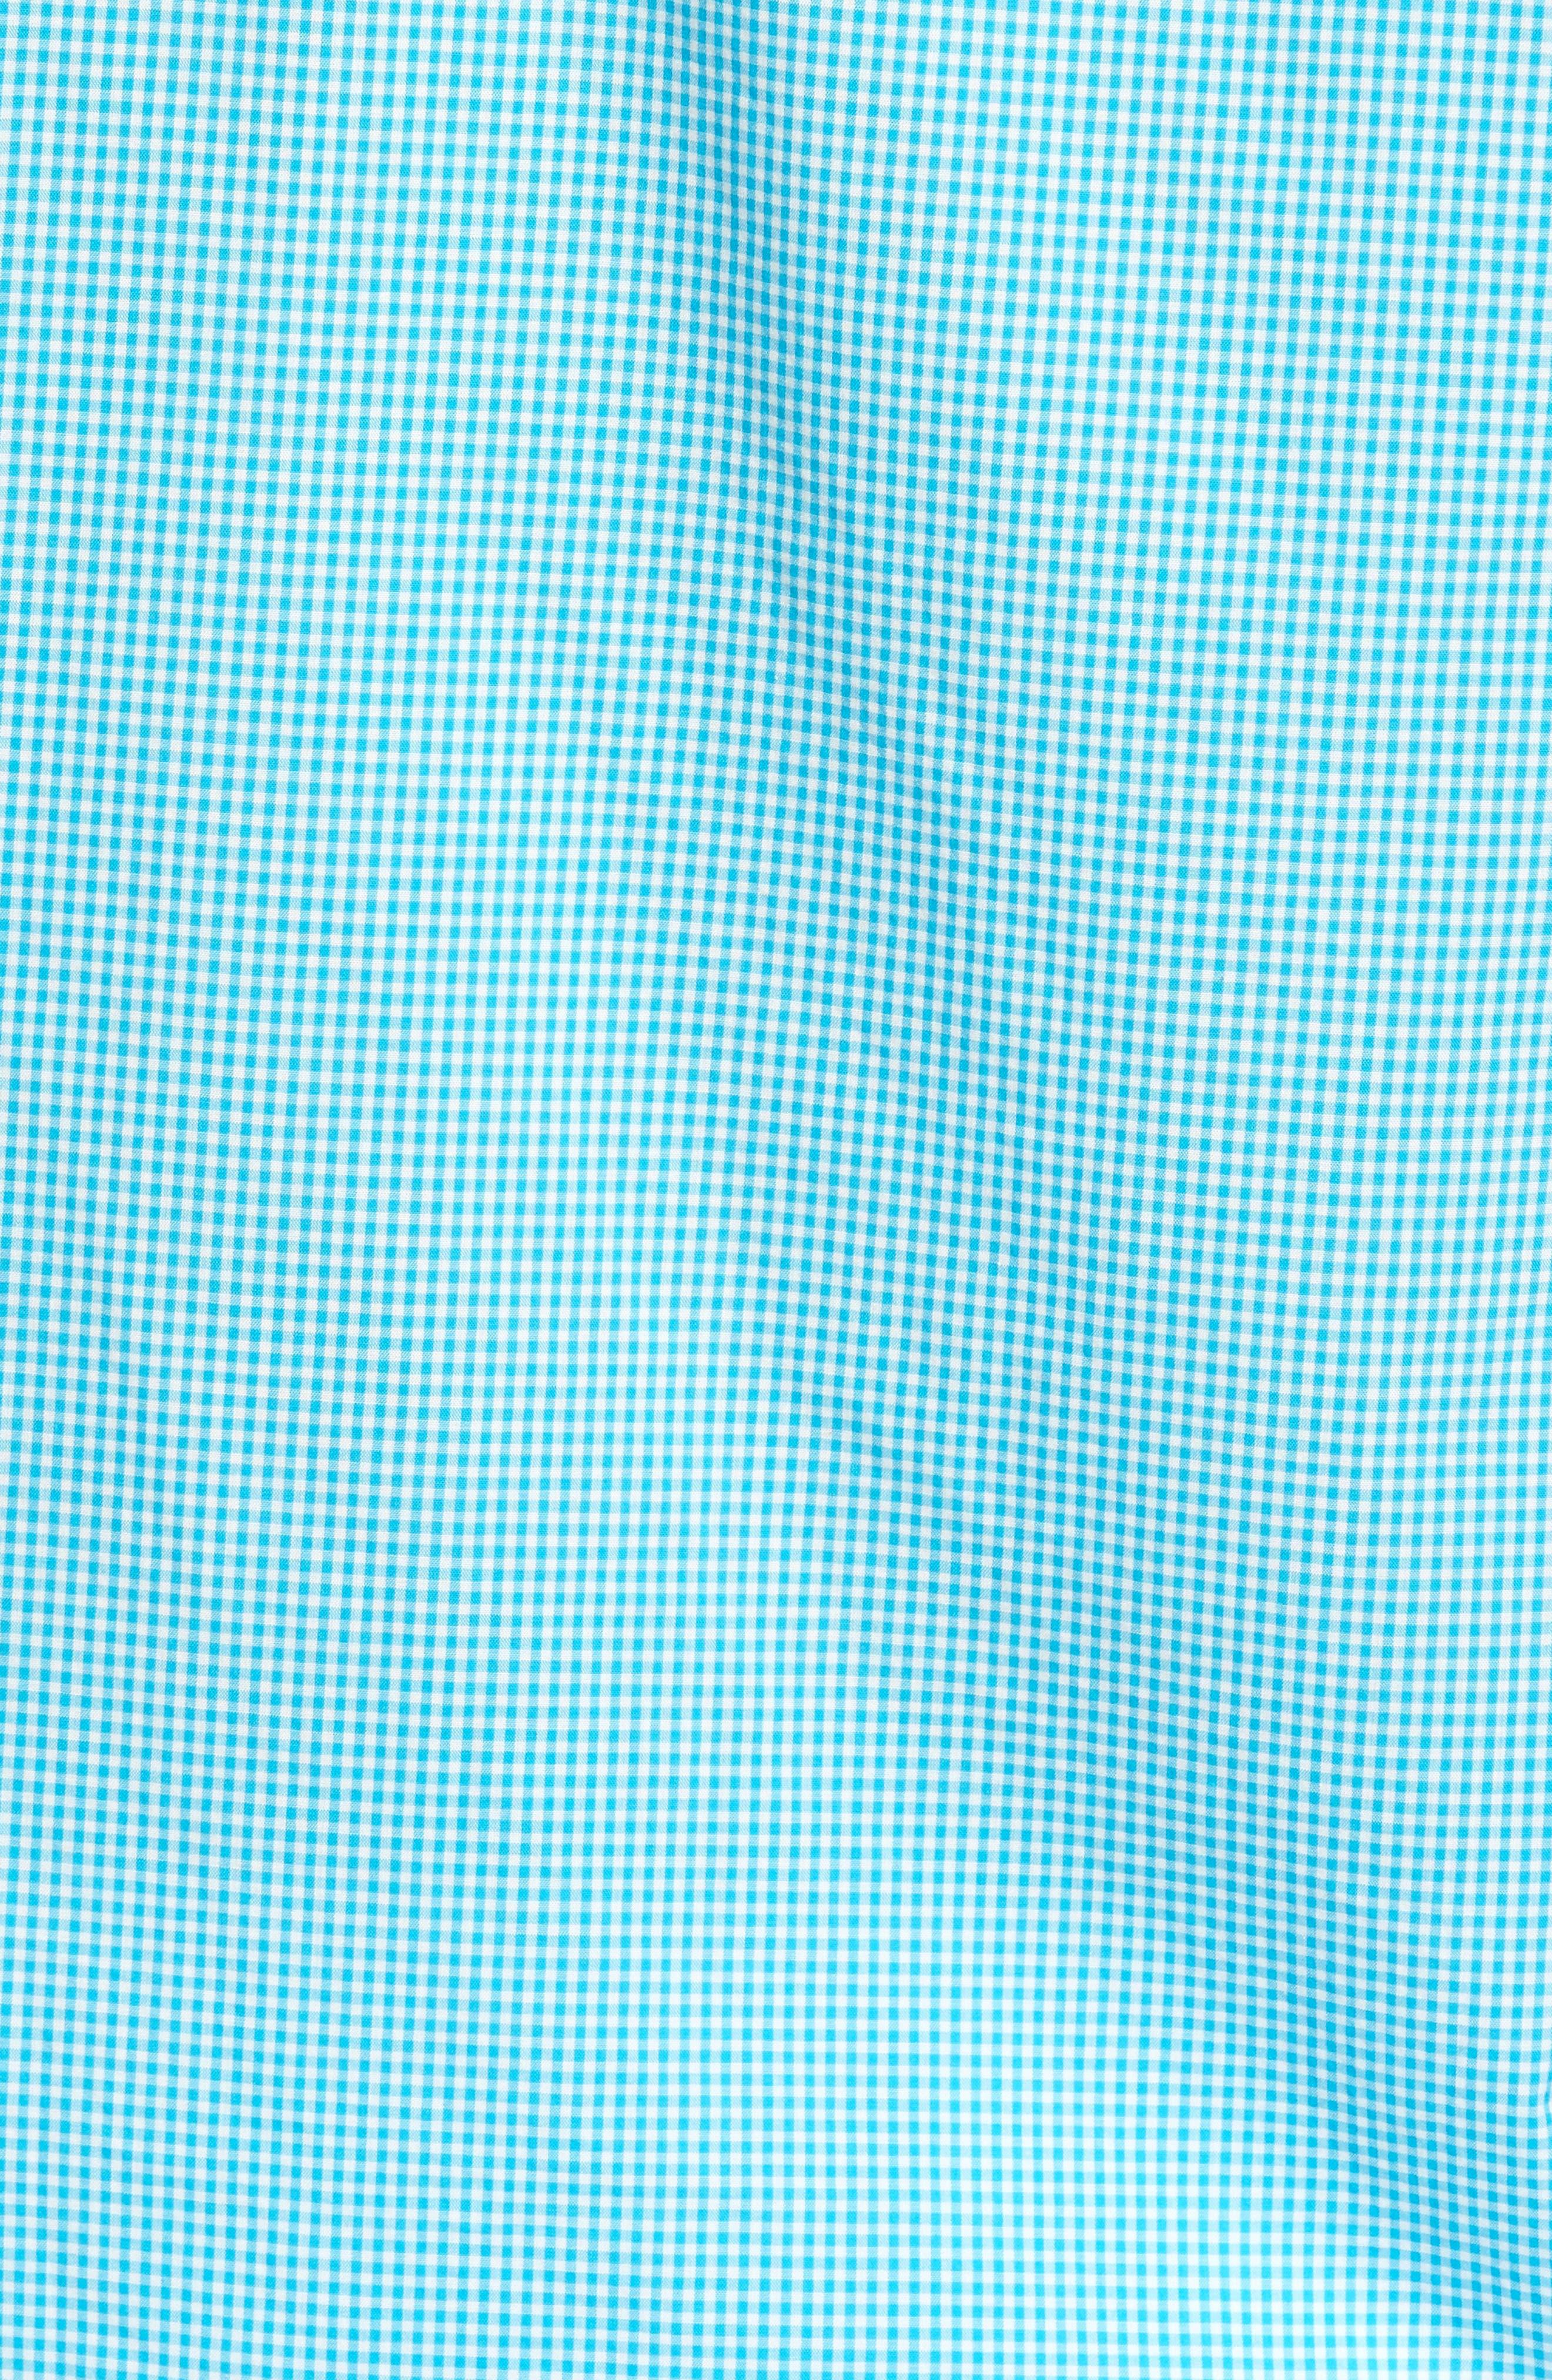 Summerweight Slim Fit Sport Shirt,                             Alternate thumbnail 5, color,                             Bonid Gingham Blue